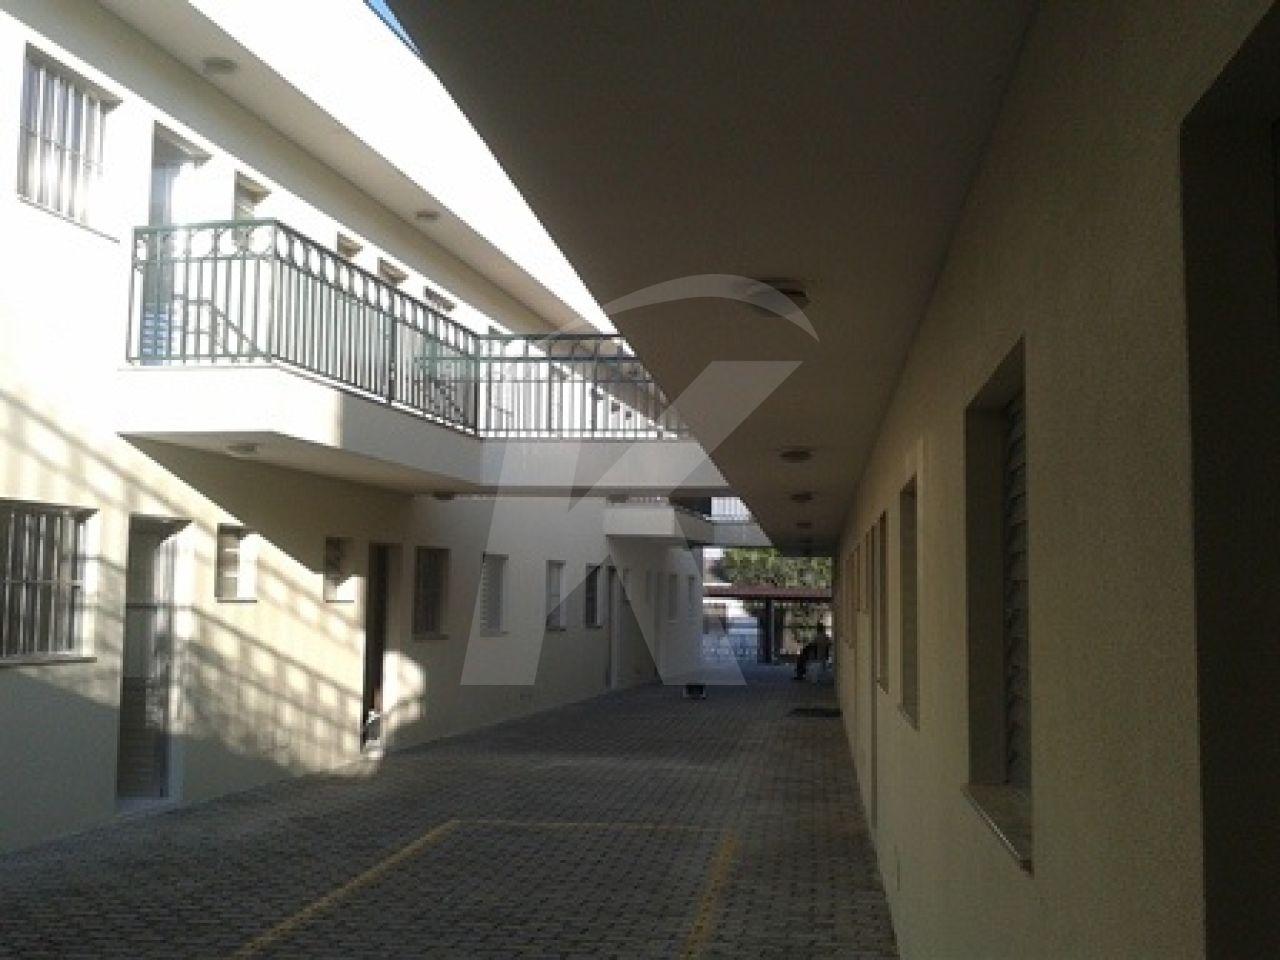 Comprar - Condomínio - Jaçanã - 1 dormitórios.